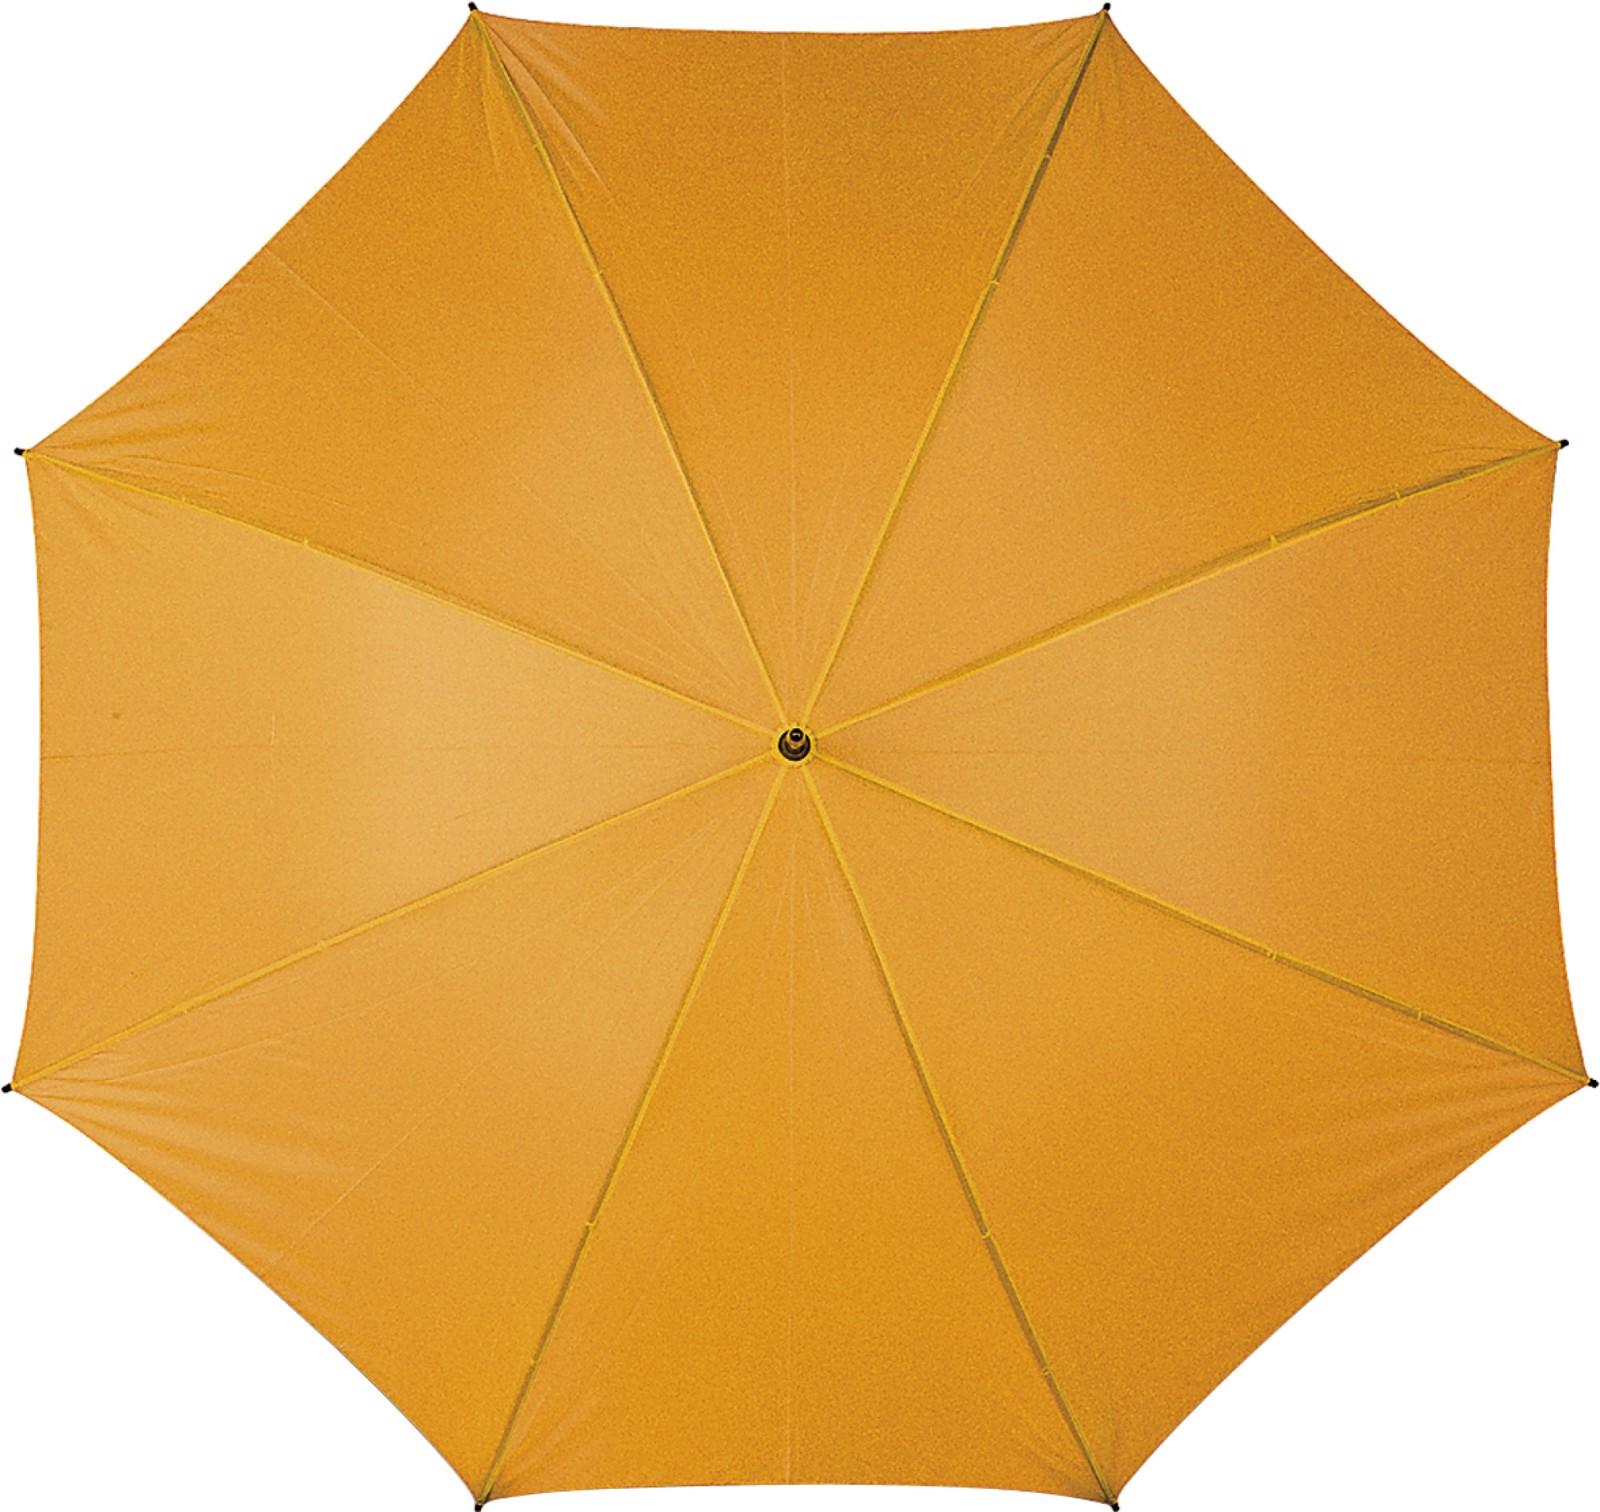 Polyester (210T) umbrella - Orange